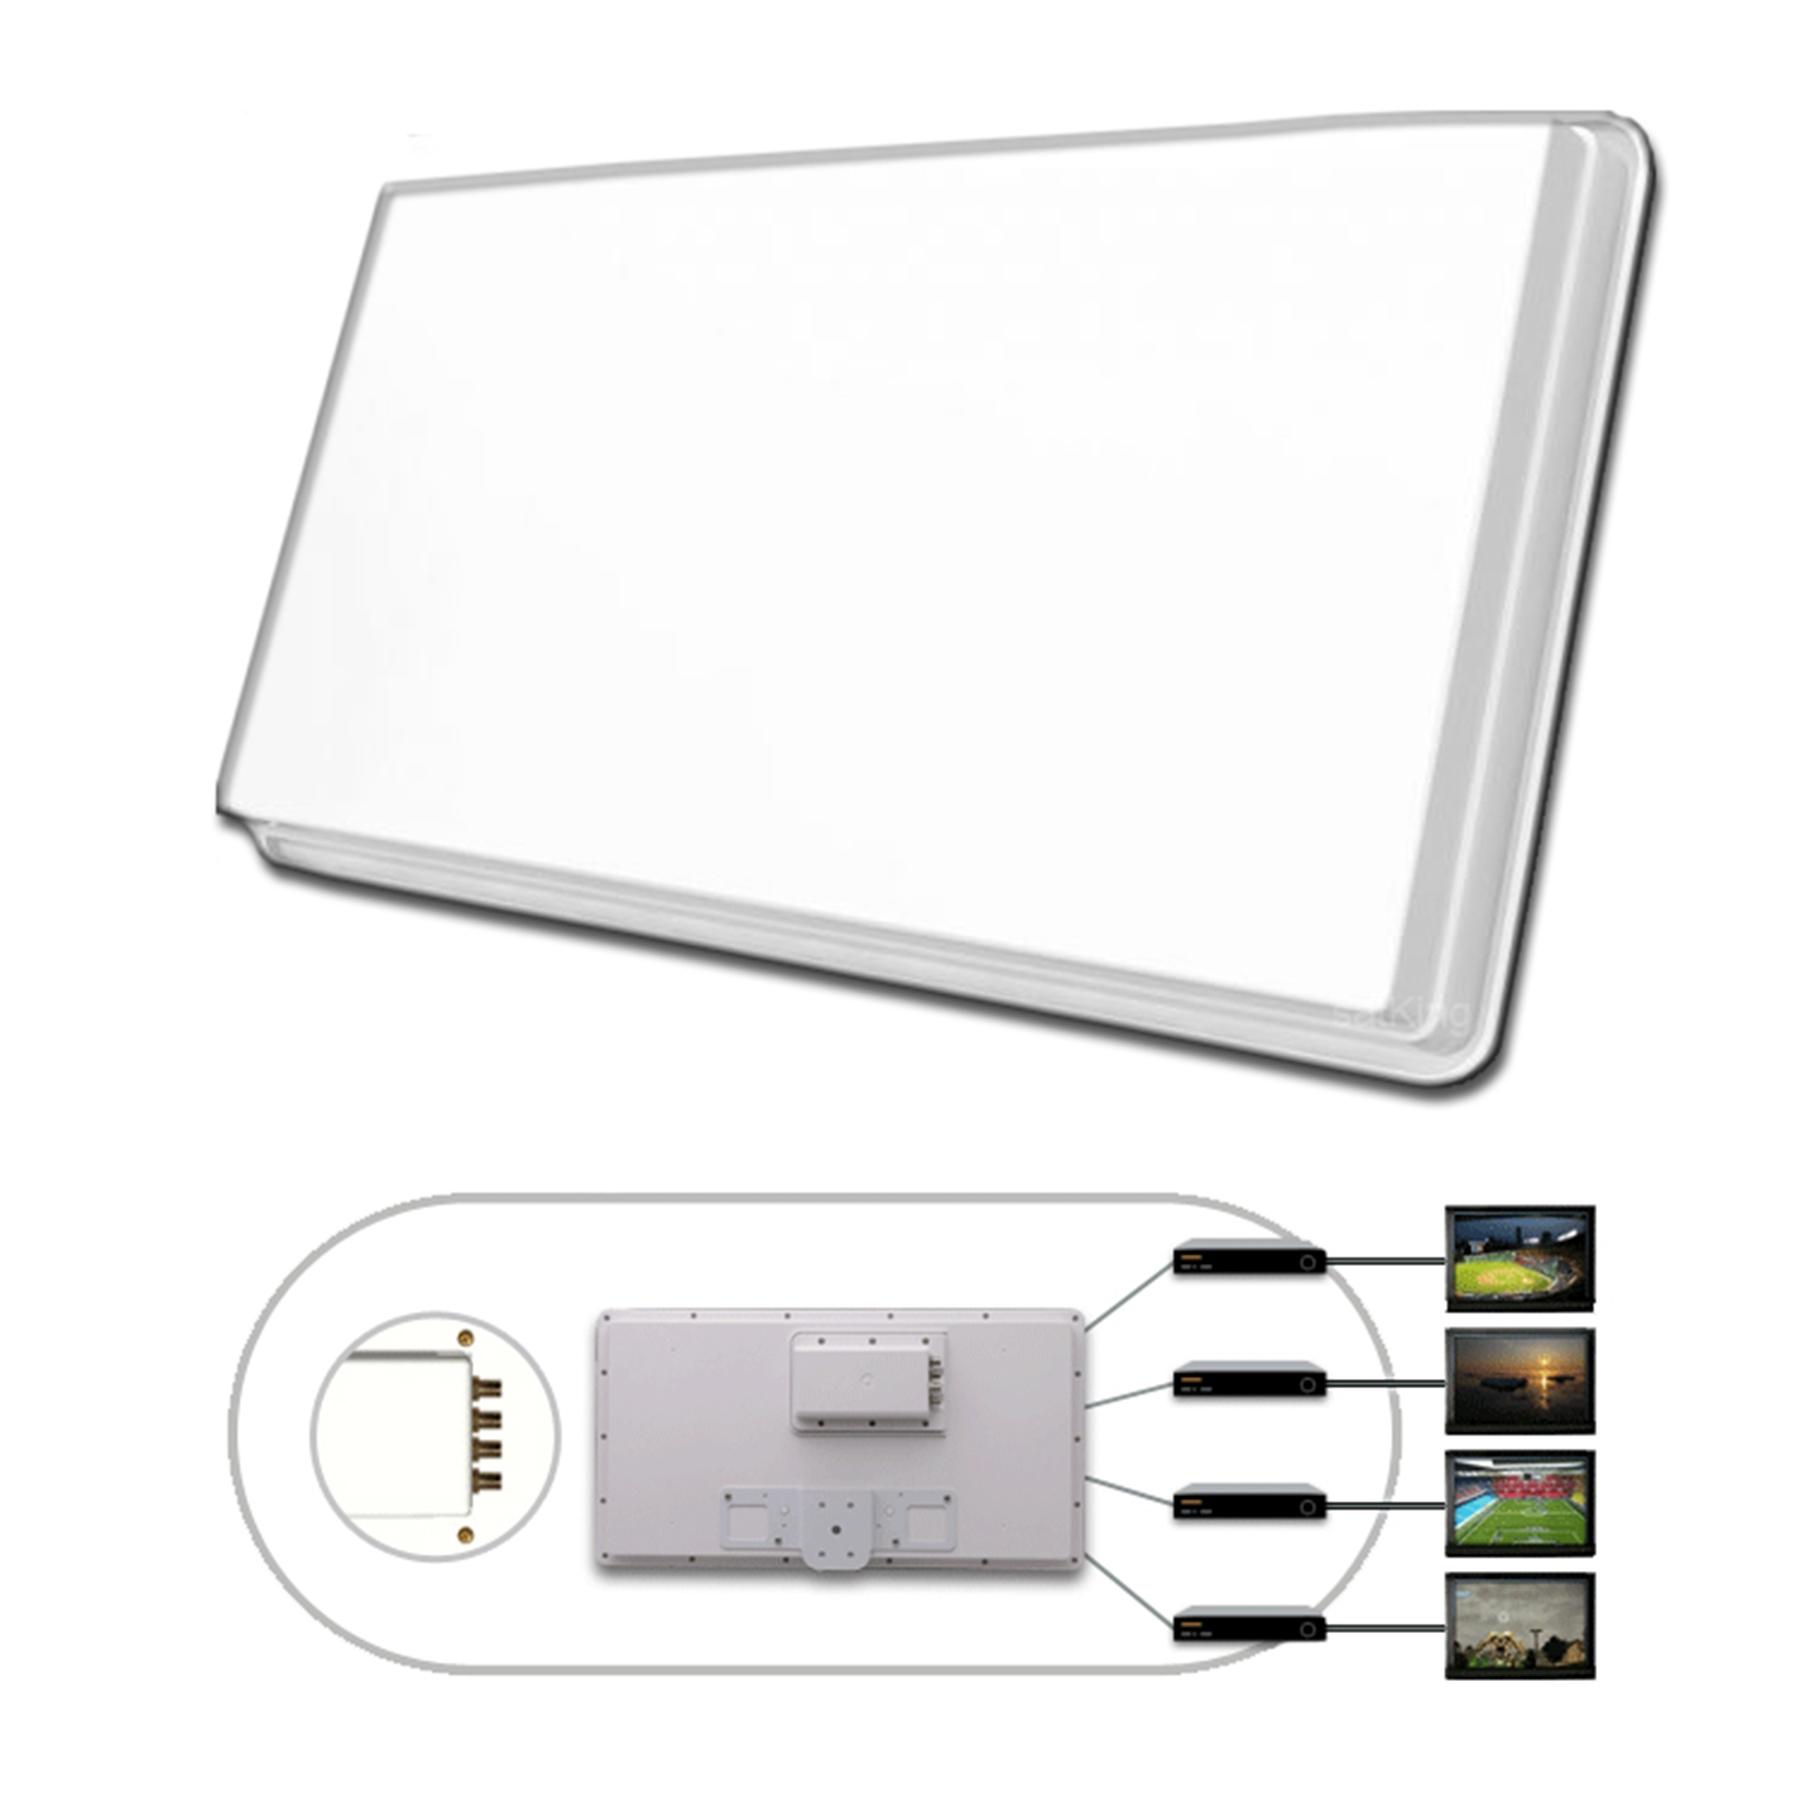 selfsat h30d4 flachantenne 4 teilnehmer quad sat spiegel. Black Bedroom Furniture Sets. Home Design Ideas